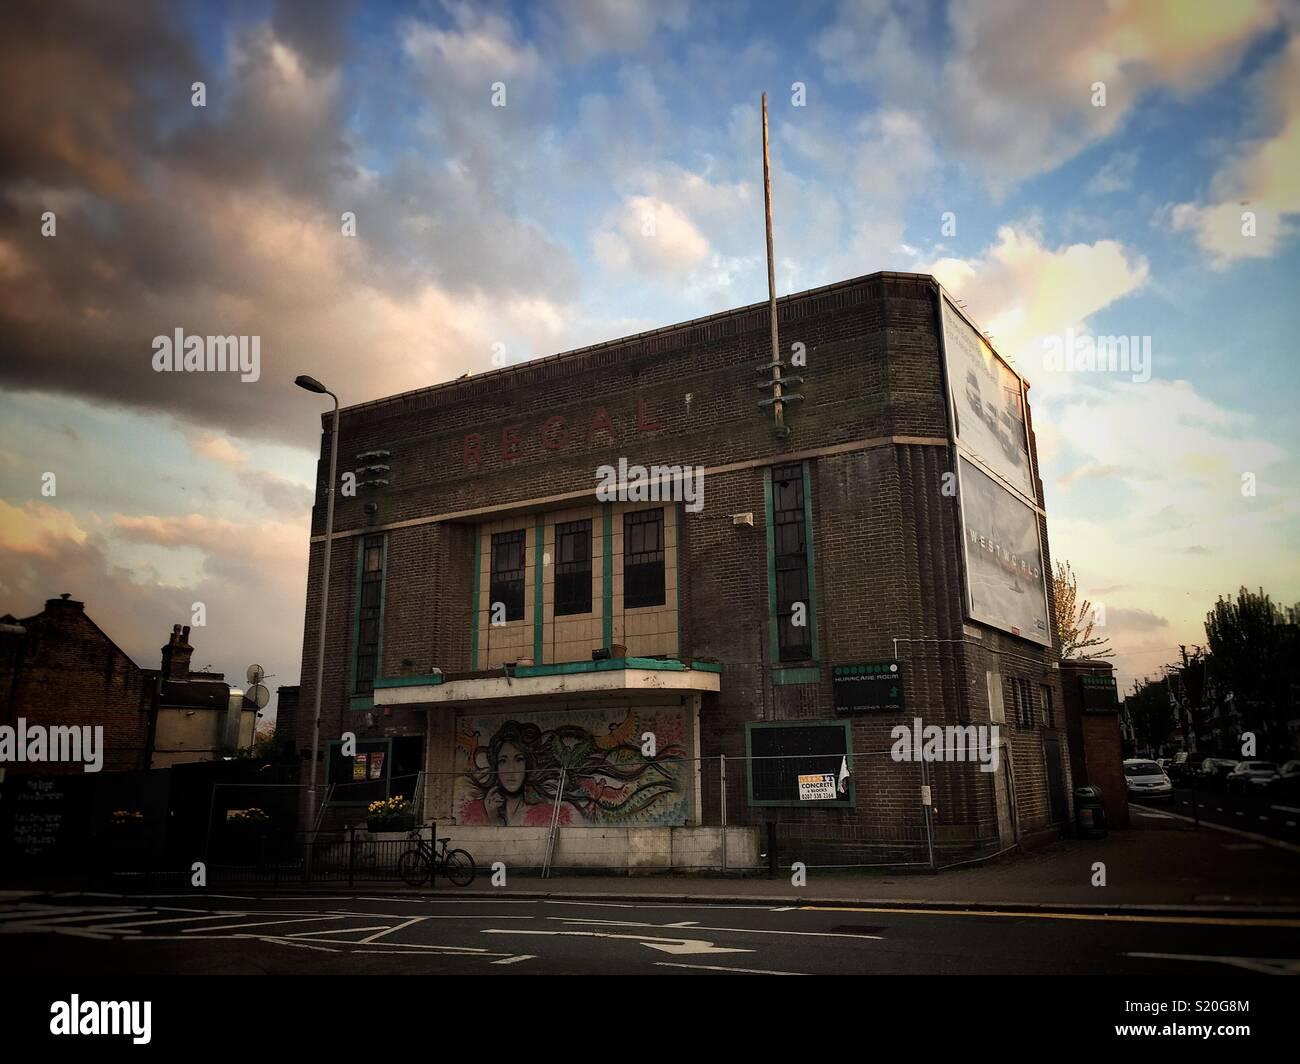 Regal Cinema Highams Park Waltham Forest London Soon To